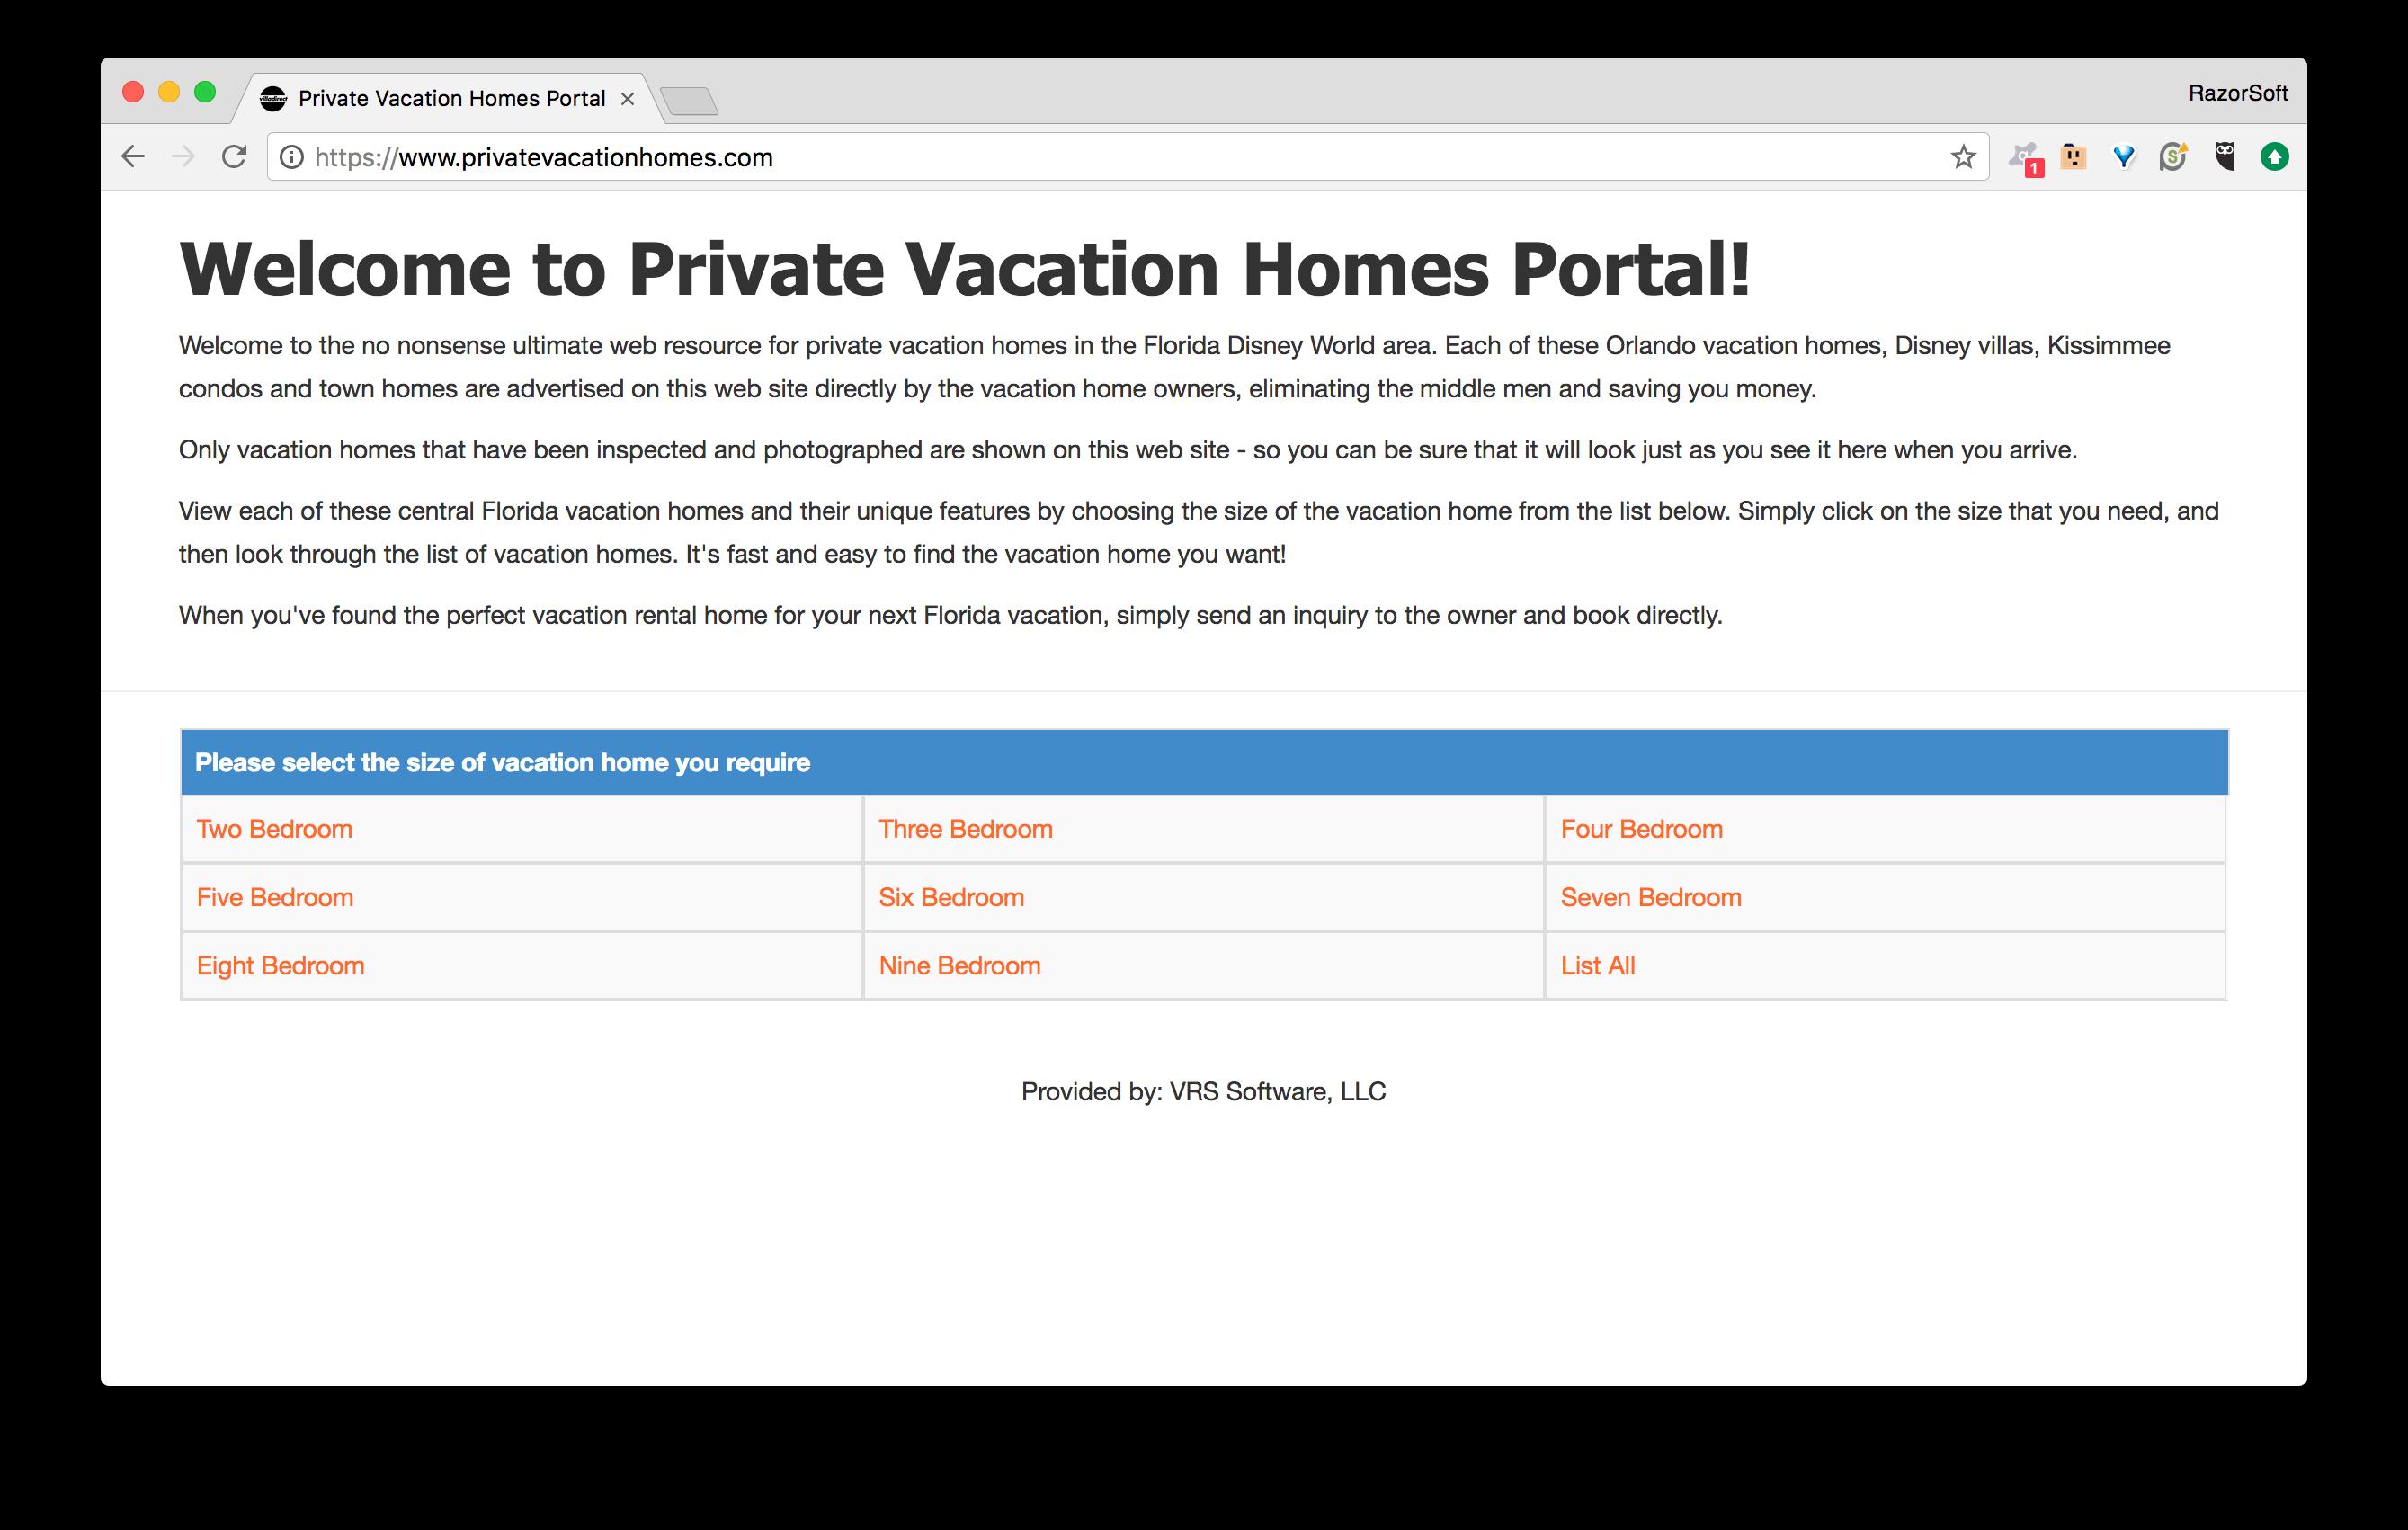 PrivateVacationHomes.com Portal